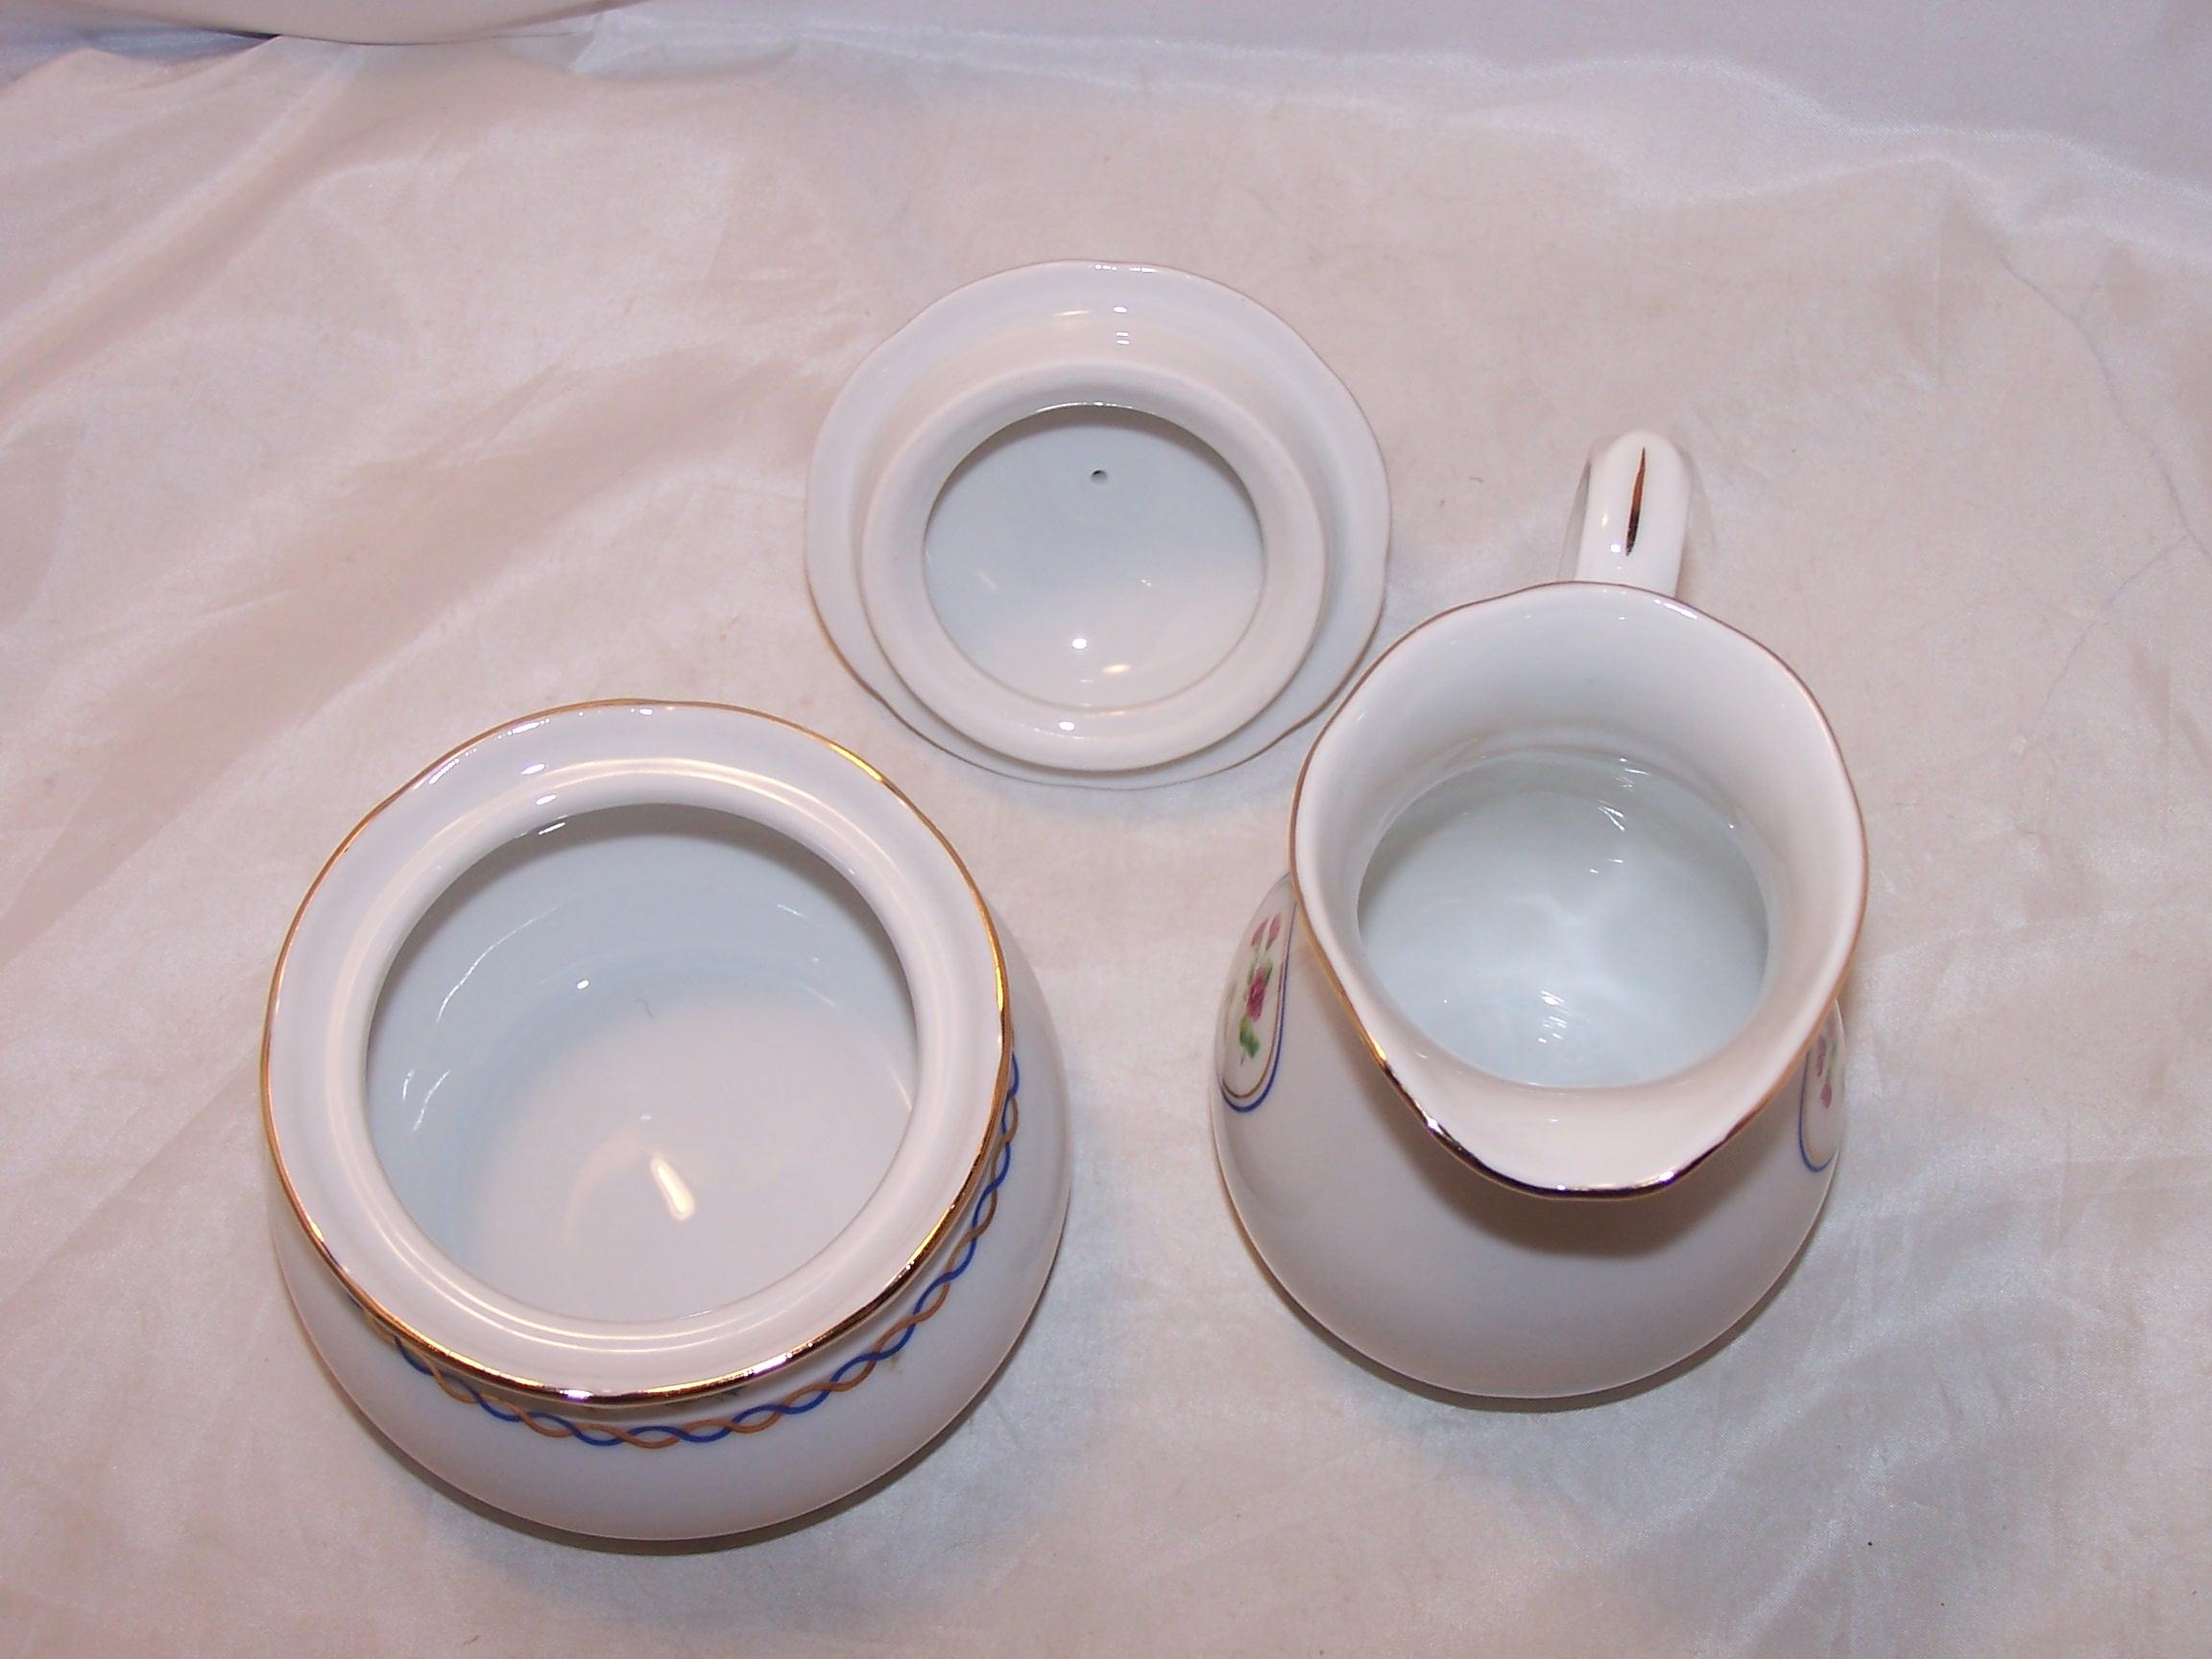 Image 4 of Baum Bros Thun Porcelain Creamer and Sugar, Czechoslovakia